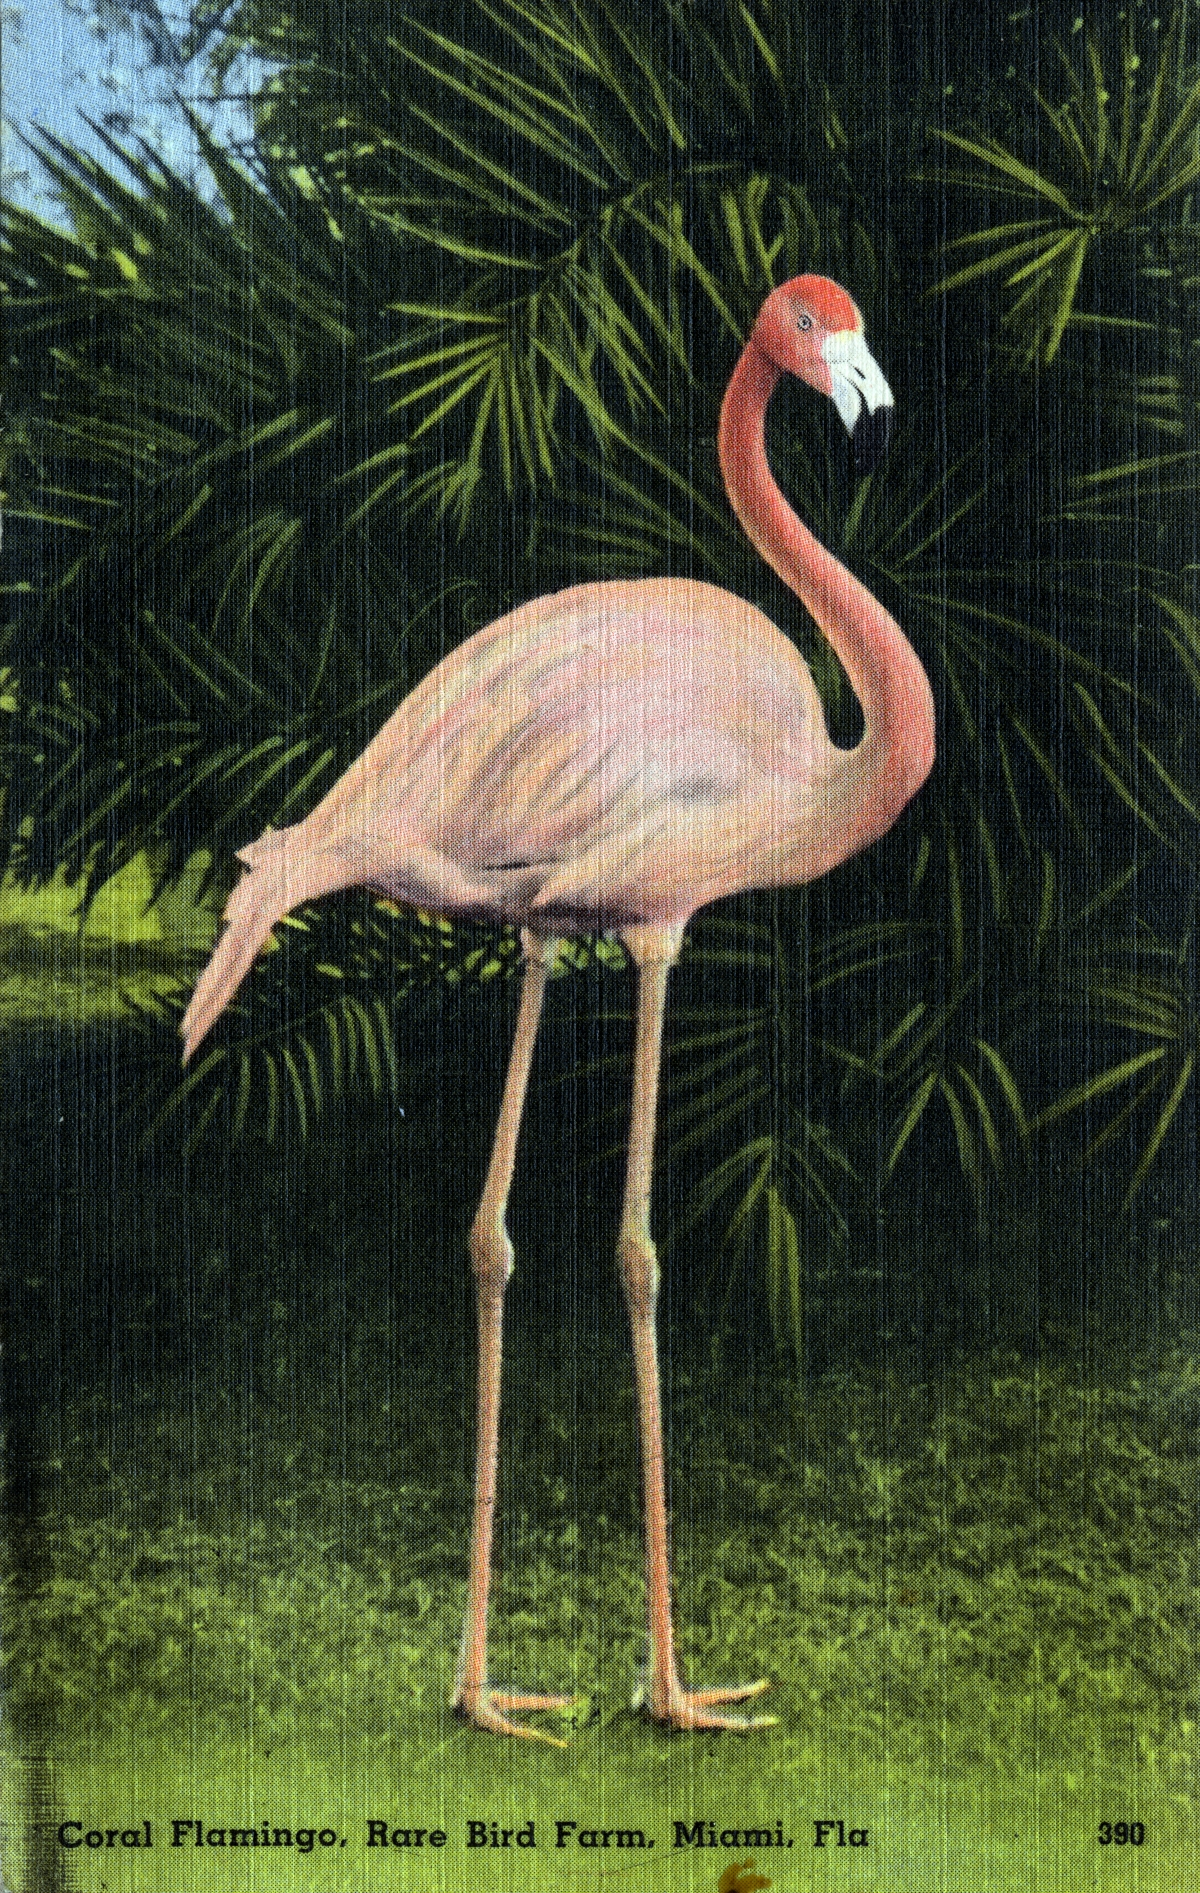 Coral Flamingo, Rare Bird Farm, Miami, Fla.